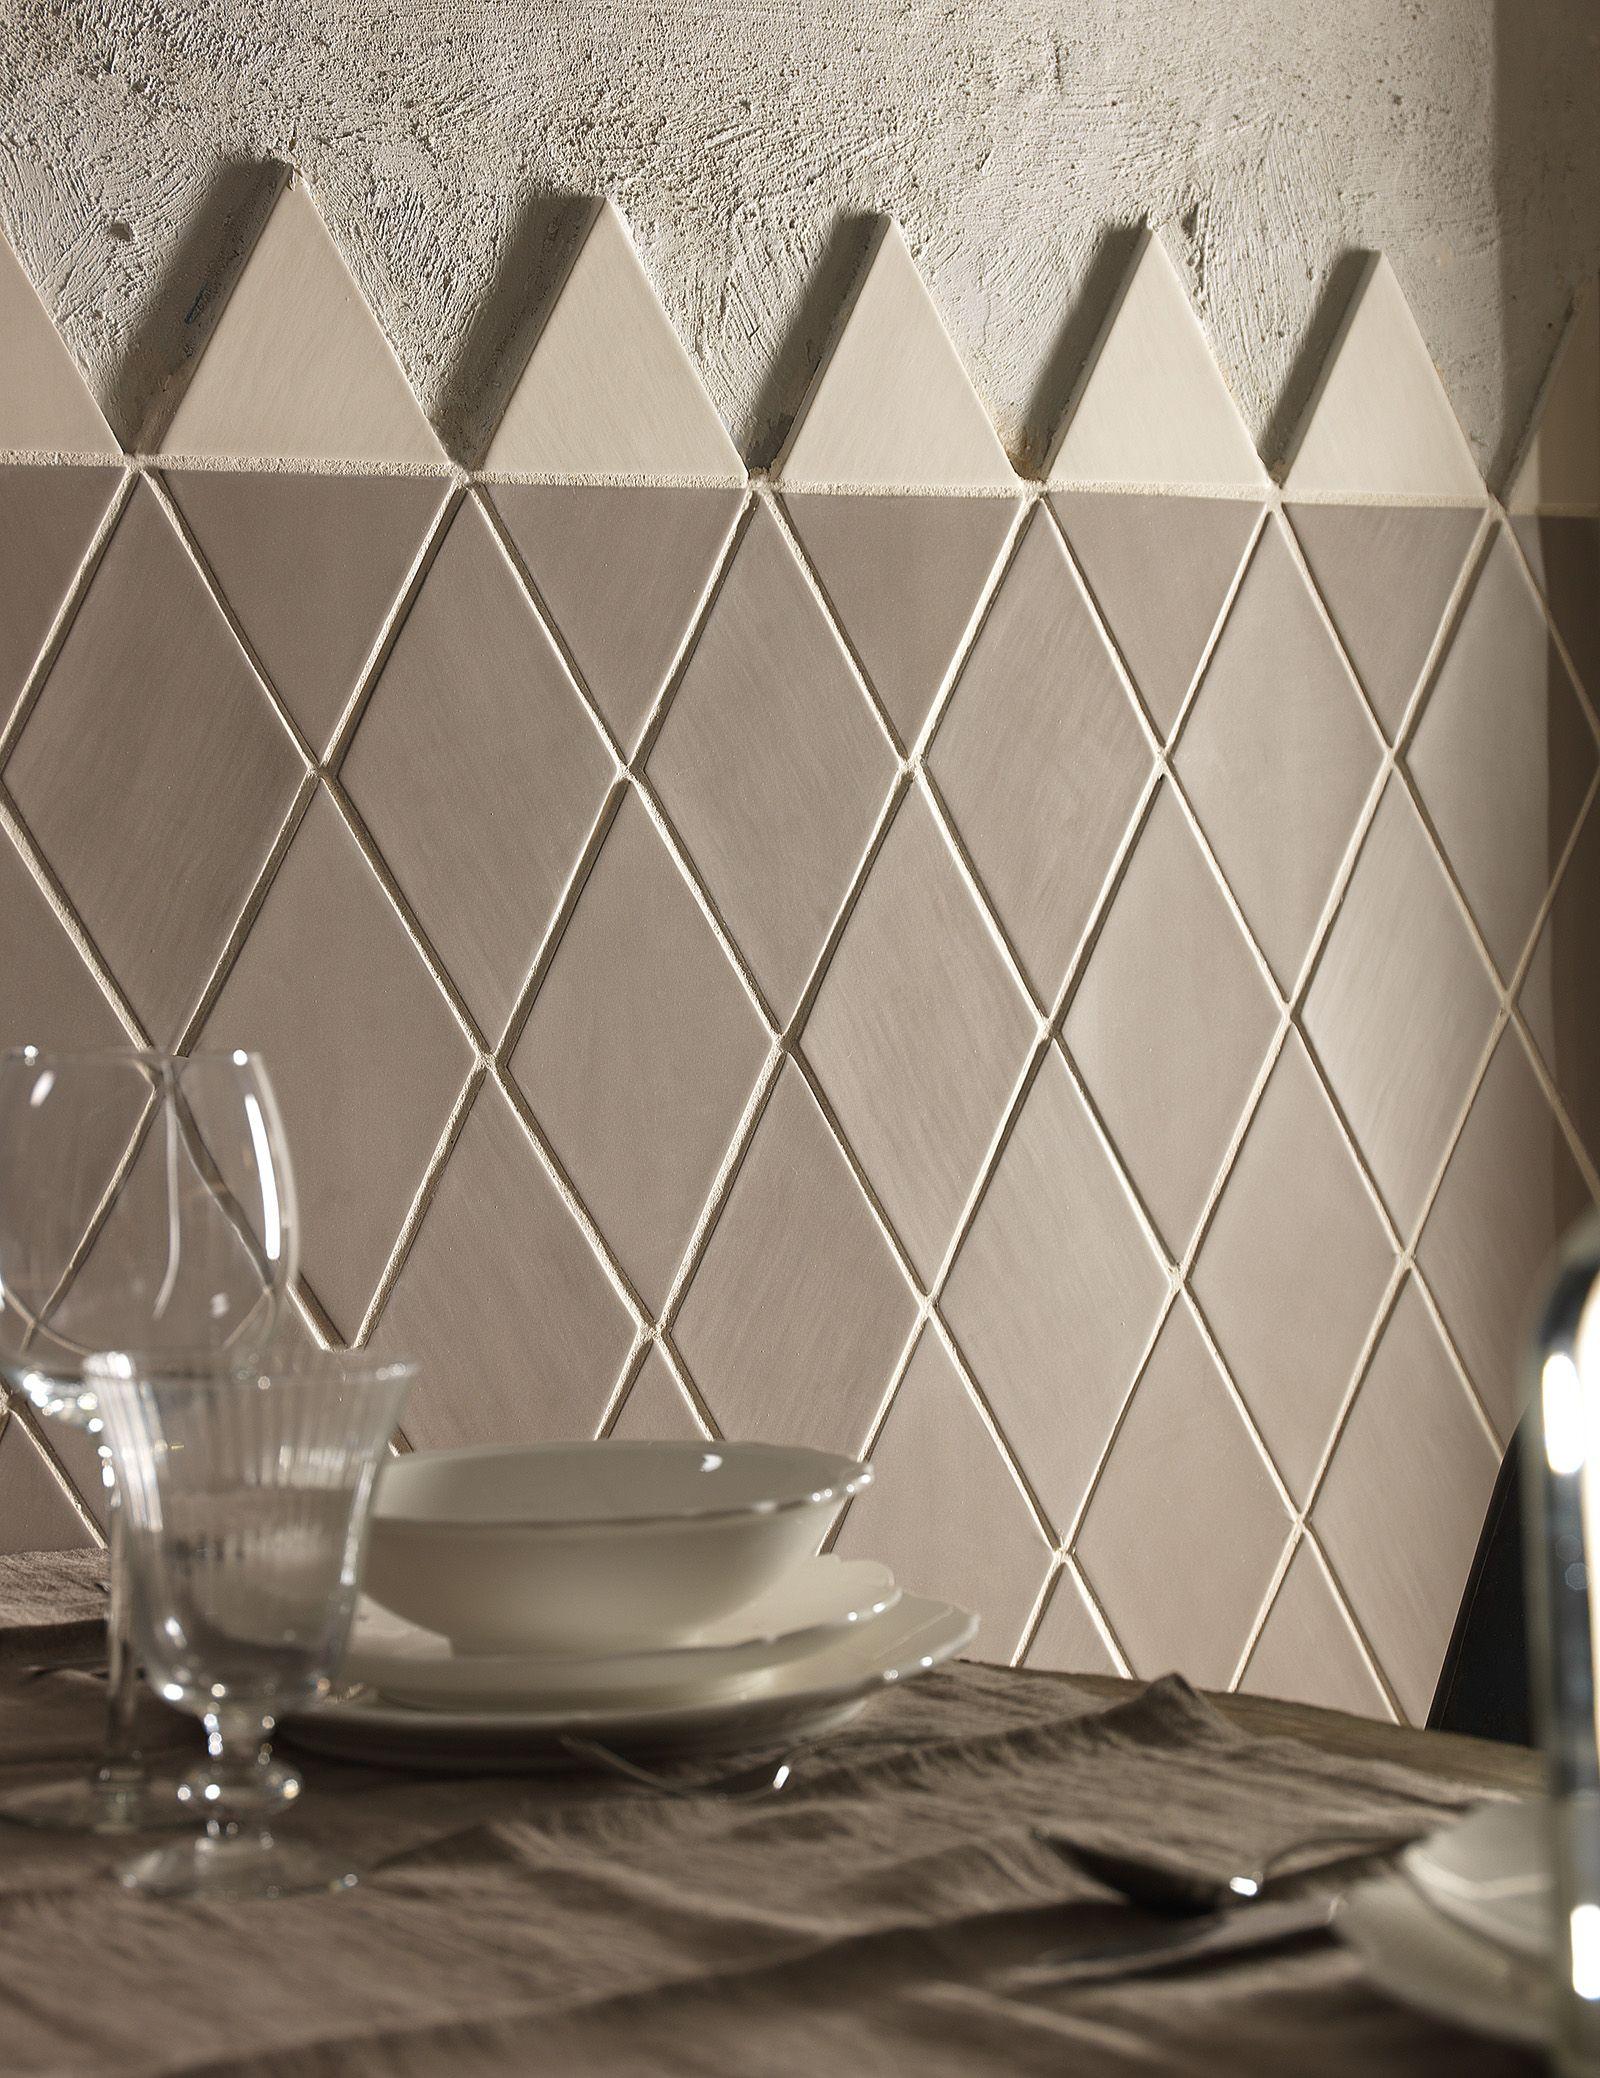 Diamond Shaped Wall Tiles For Kitchen Backsplash Or Feature Wall Tile Suppliers Diamond Tile Tiles